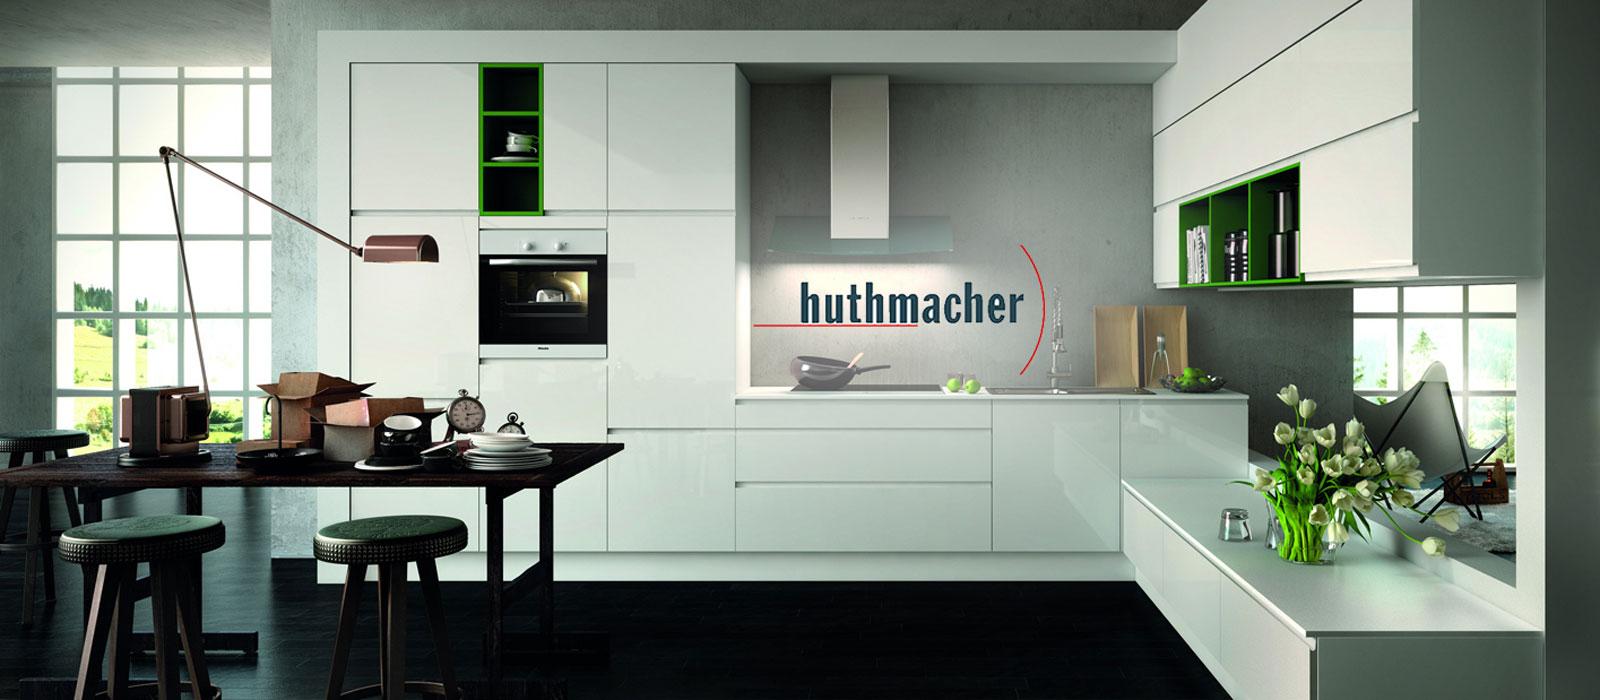 k chenstudio gr nstadt k chenstudio worms k chenstudio. Black Bedroom Furniture Sets. Home Design Ideas